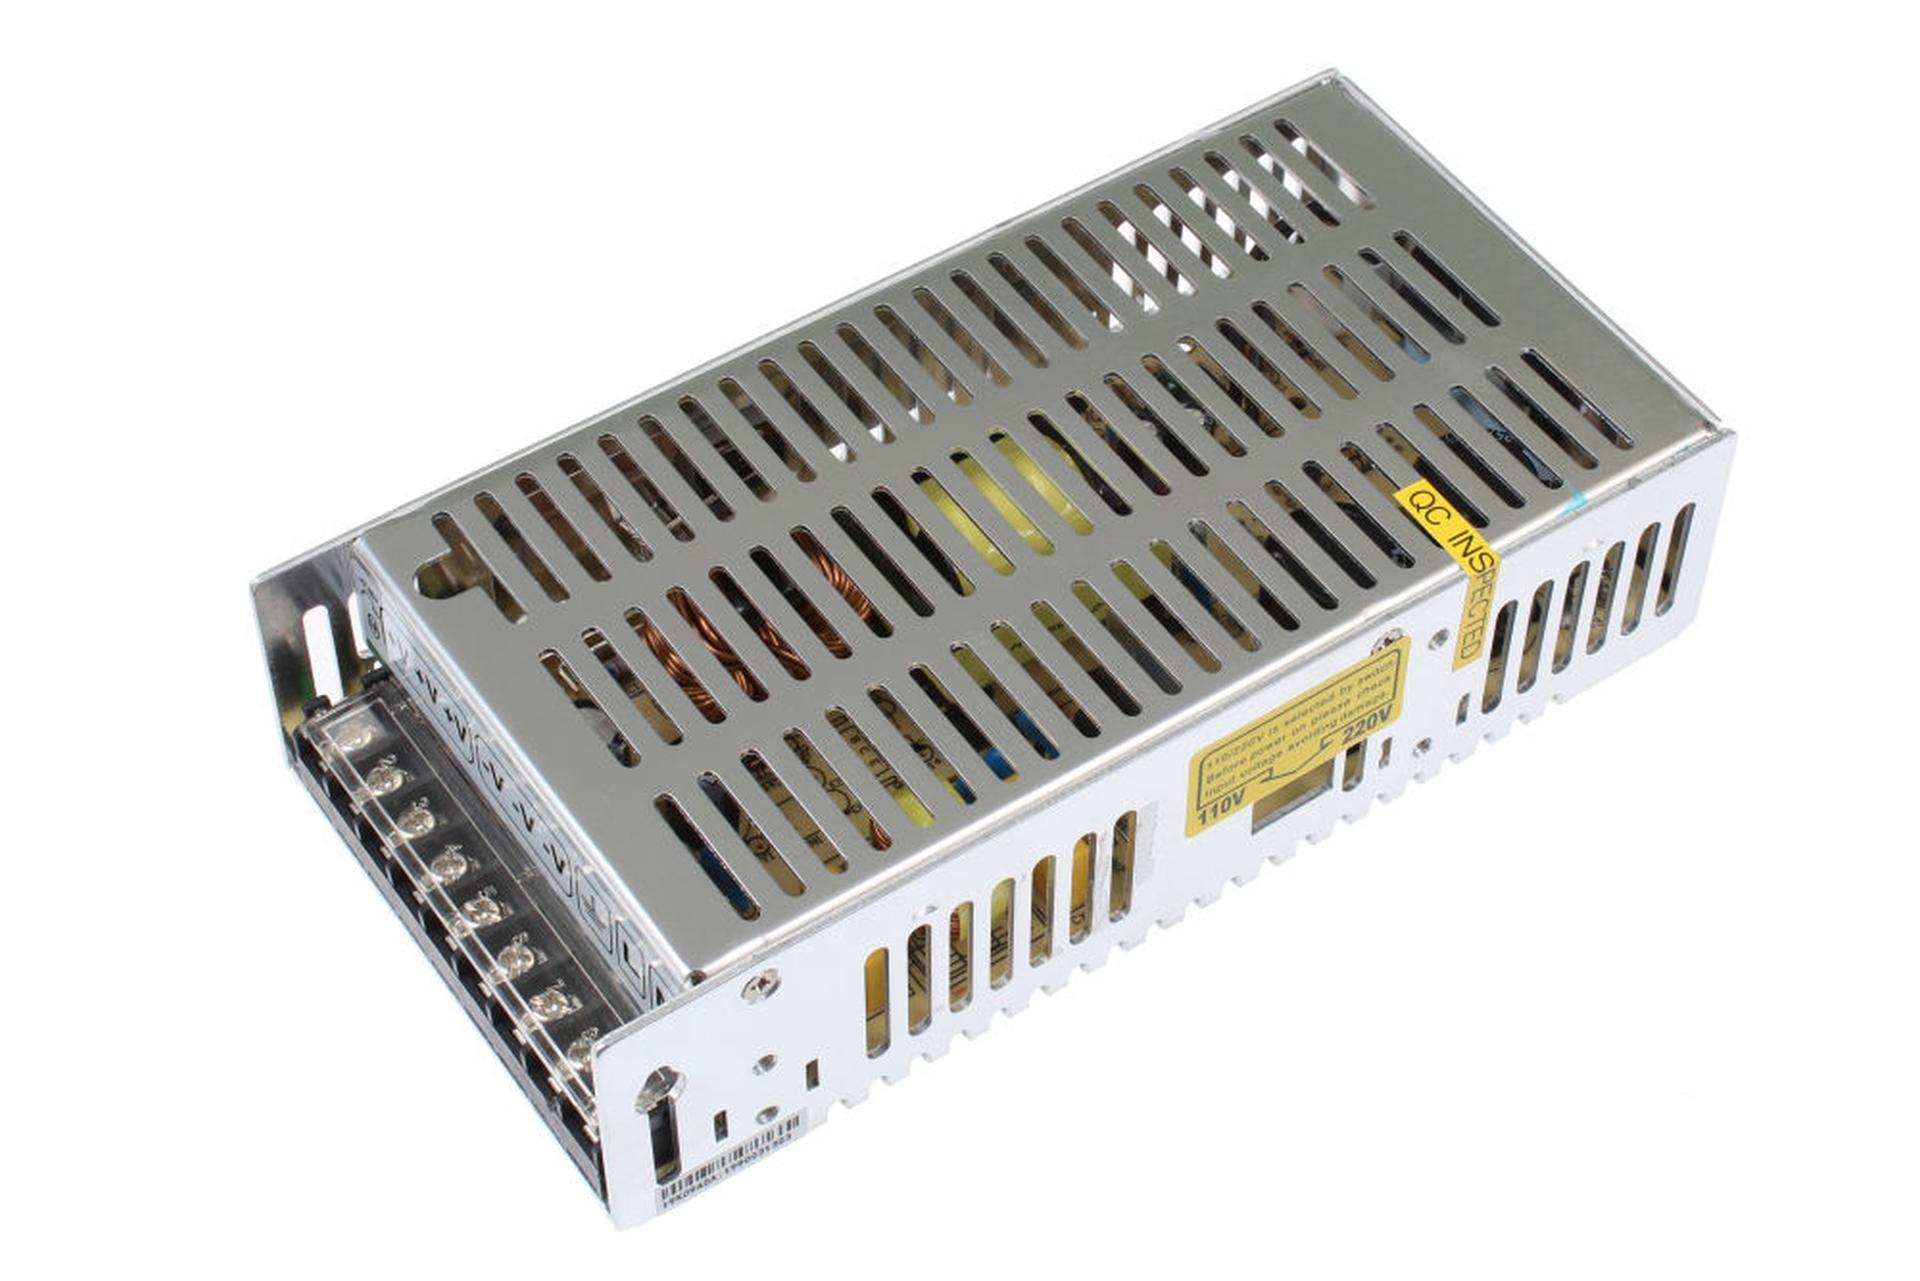 T-LED LED zdroj (trafo) 24V 240W - vnutorný 05525